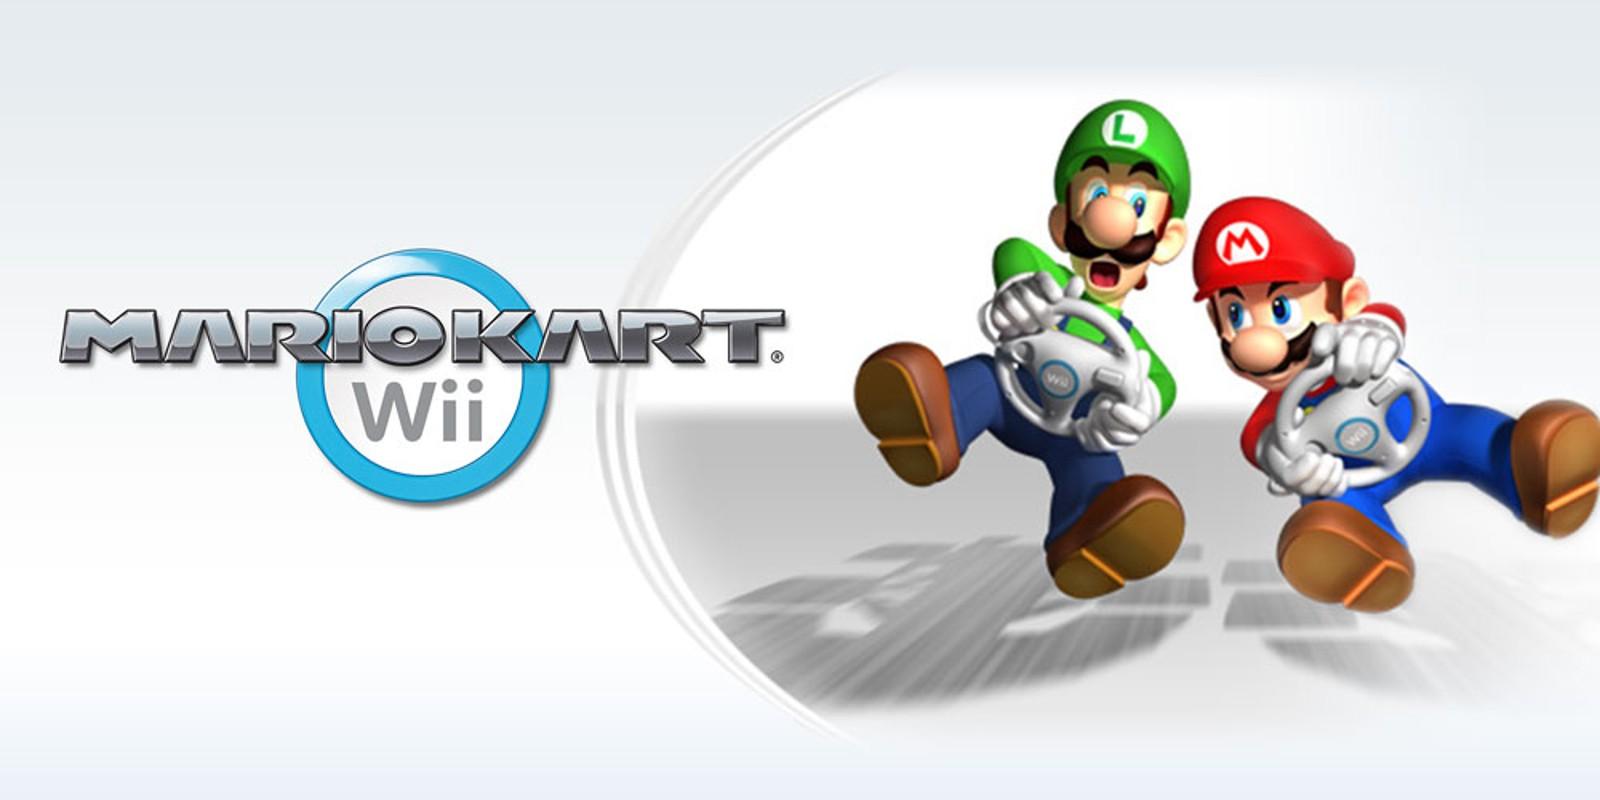 Mario Kart Wii | Wii | Jeux | Nintendo